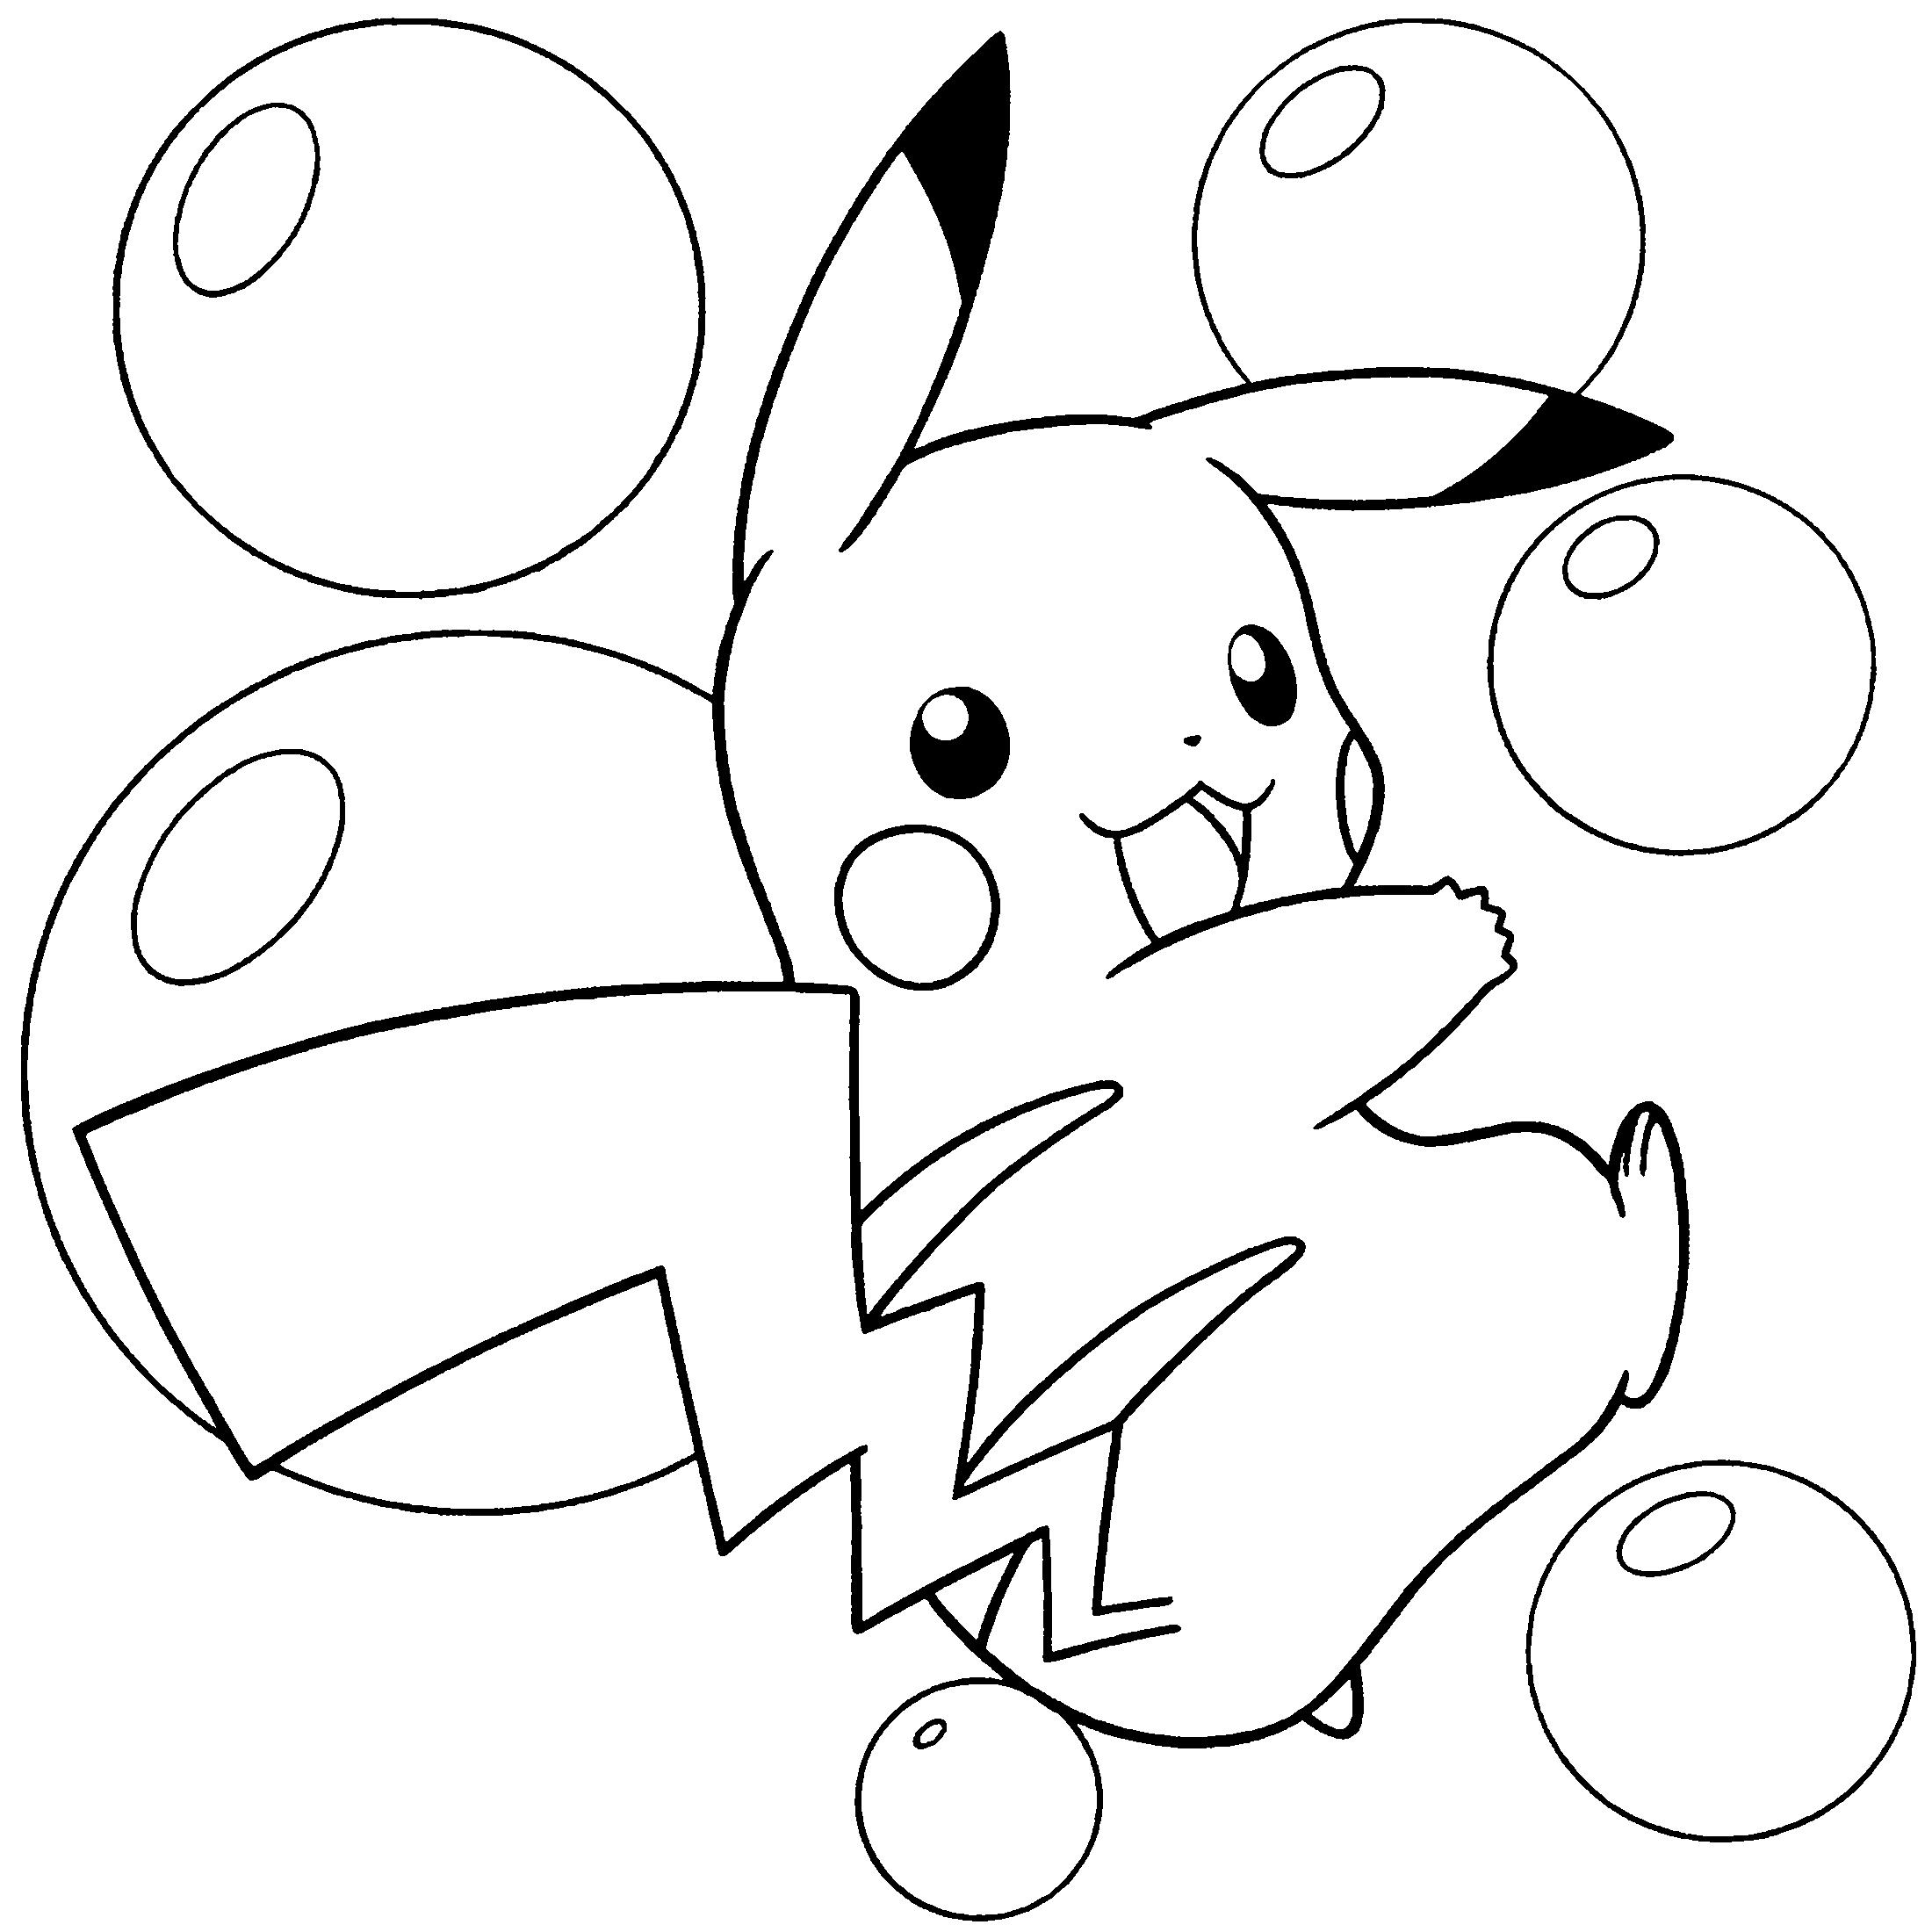 pokemon coloring pics pokemon coloring pages 1 coloring kids pokemon coloring pics